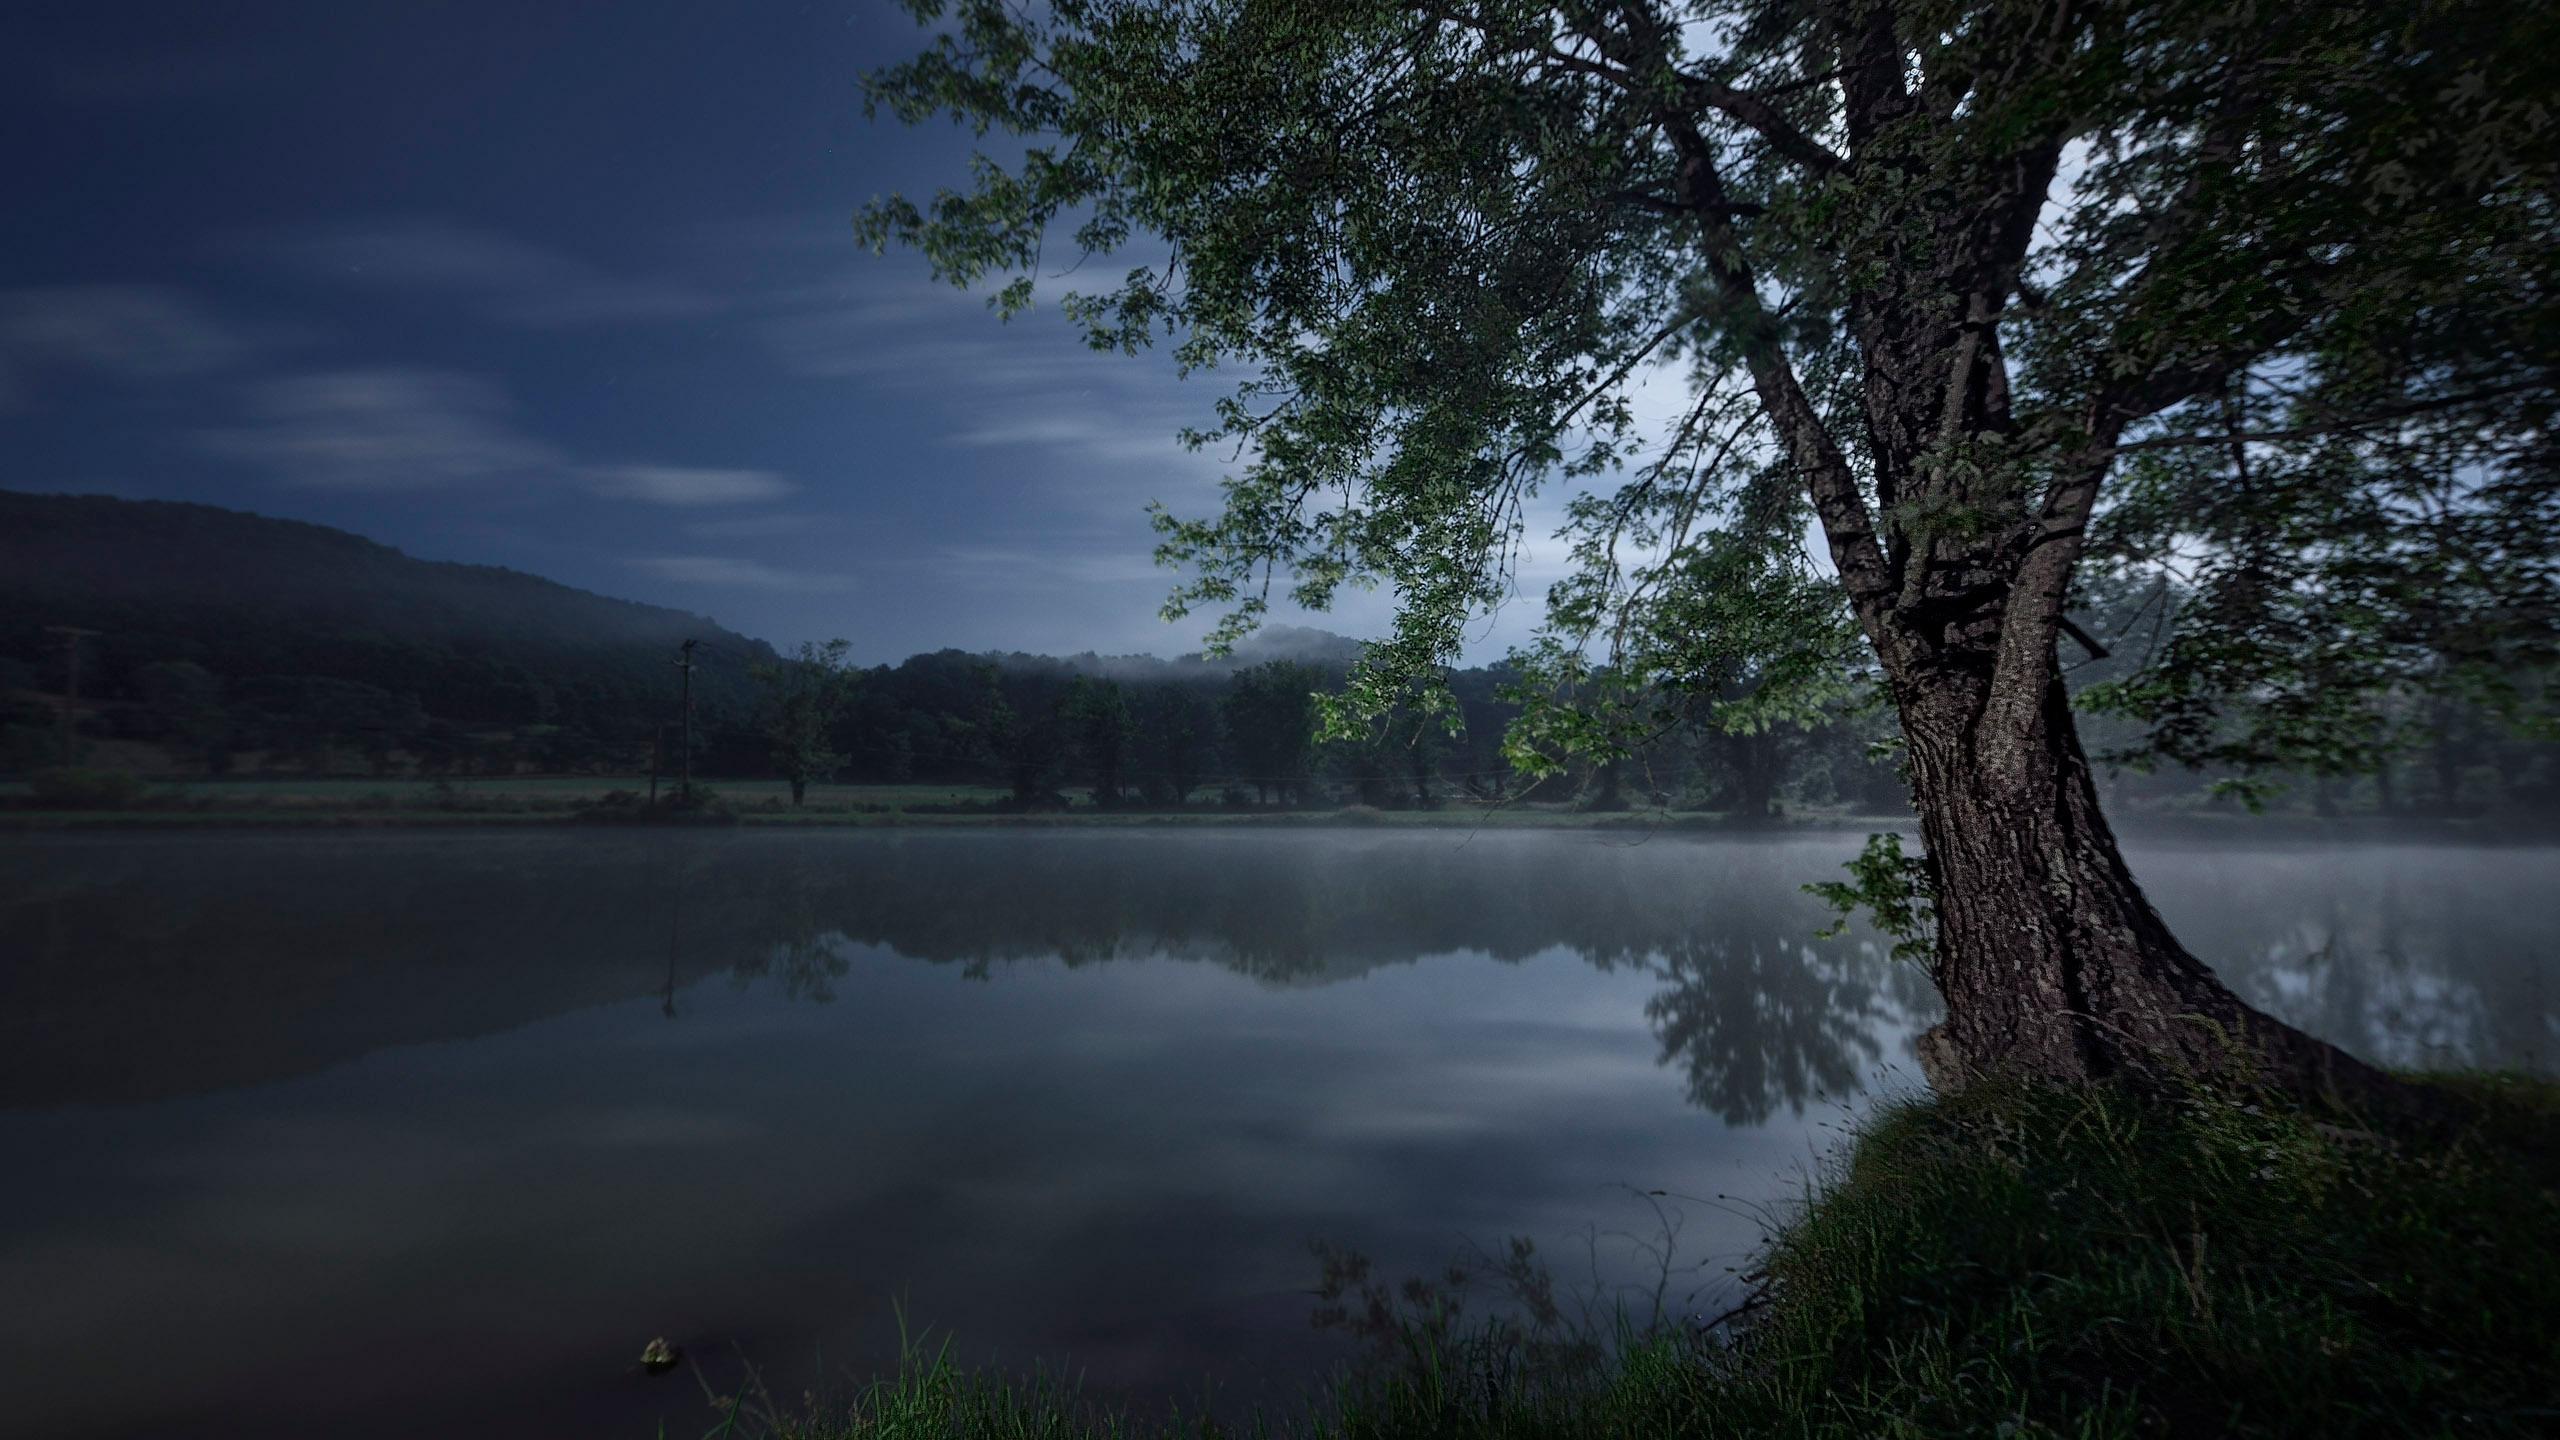 7439_kenlee_2017-07-09_2230_west-virginia_lakeshawnee-2mf8iso200-flat-fog-over-lake-new-HEADER-PHOTOFOCUS